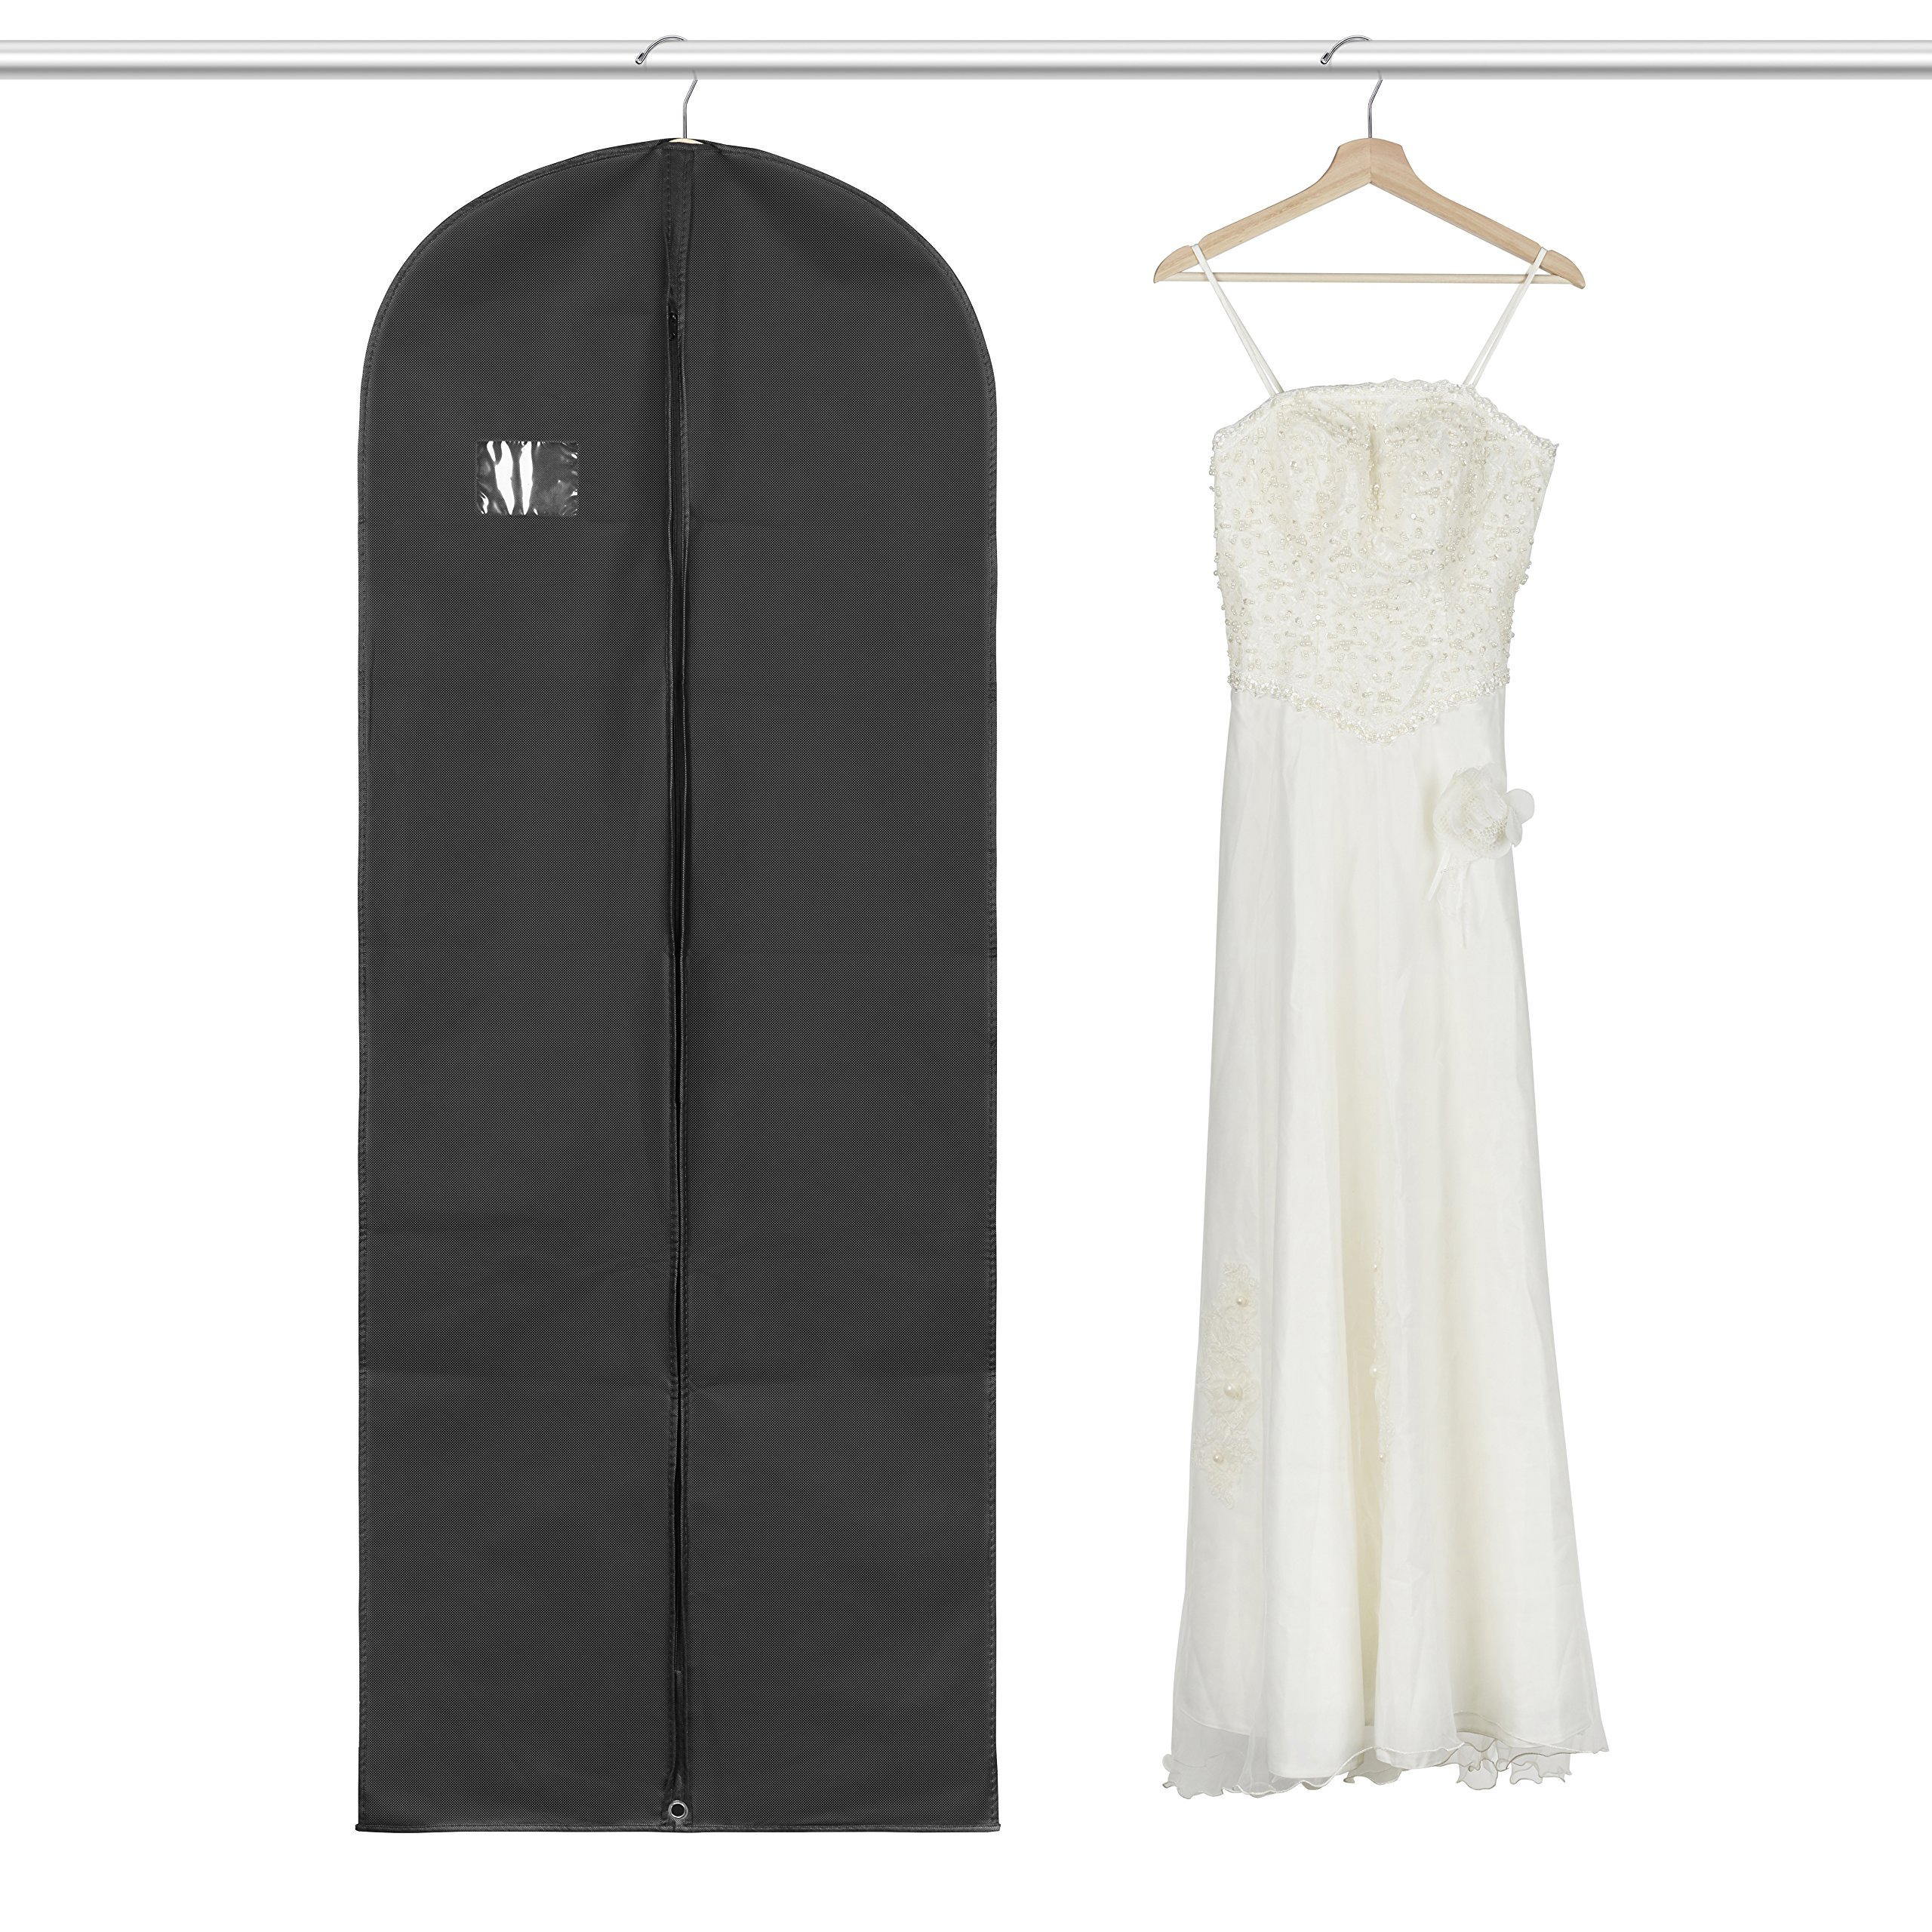 6173bf94a59 Get Quotations · Titan Mall Suit Long Dress Garment Bag Black Robe Garment  Bag (24